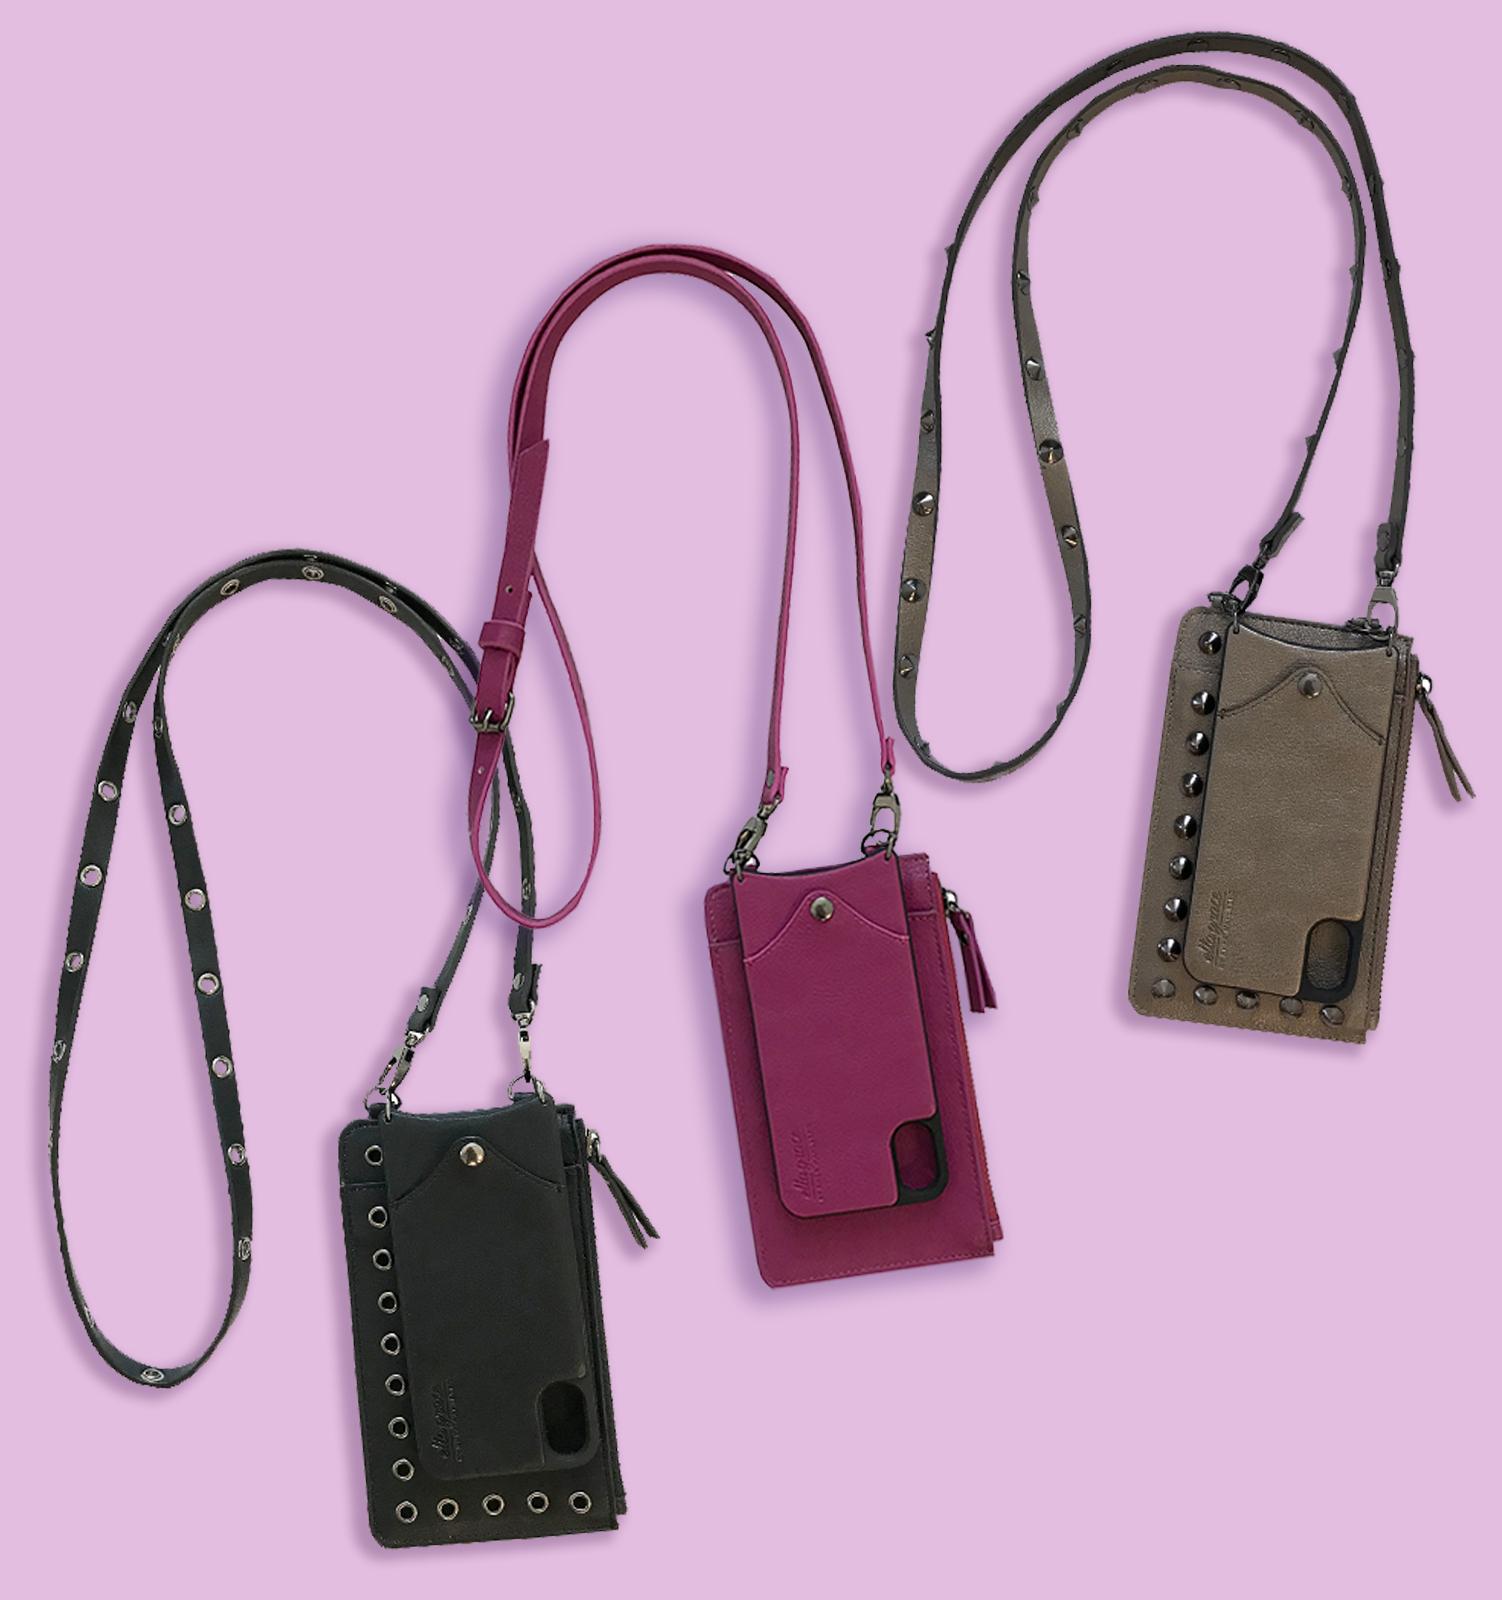 iPhone X + XS case bag set - SHOP THE COLLECTION